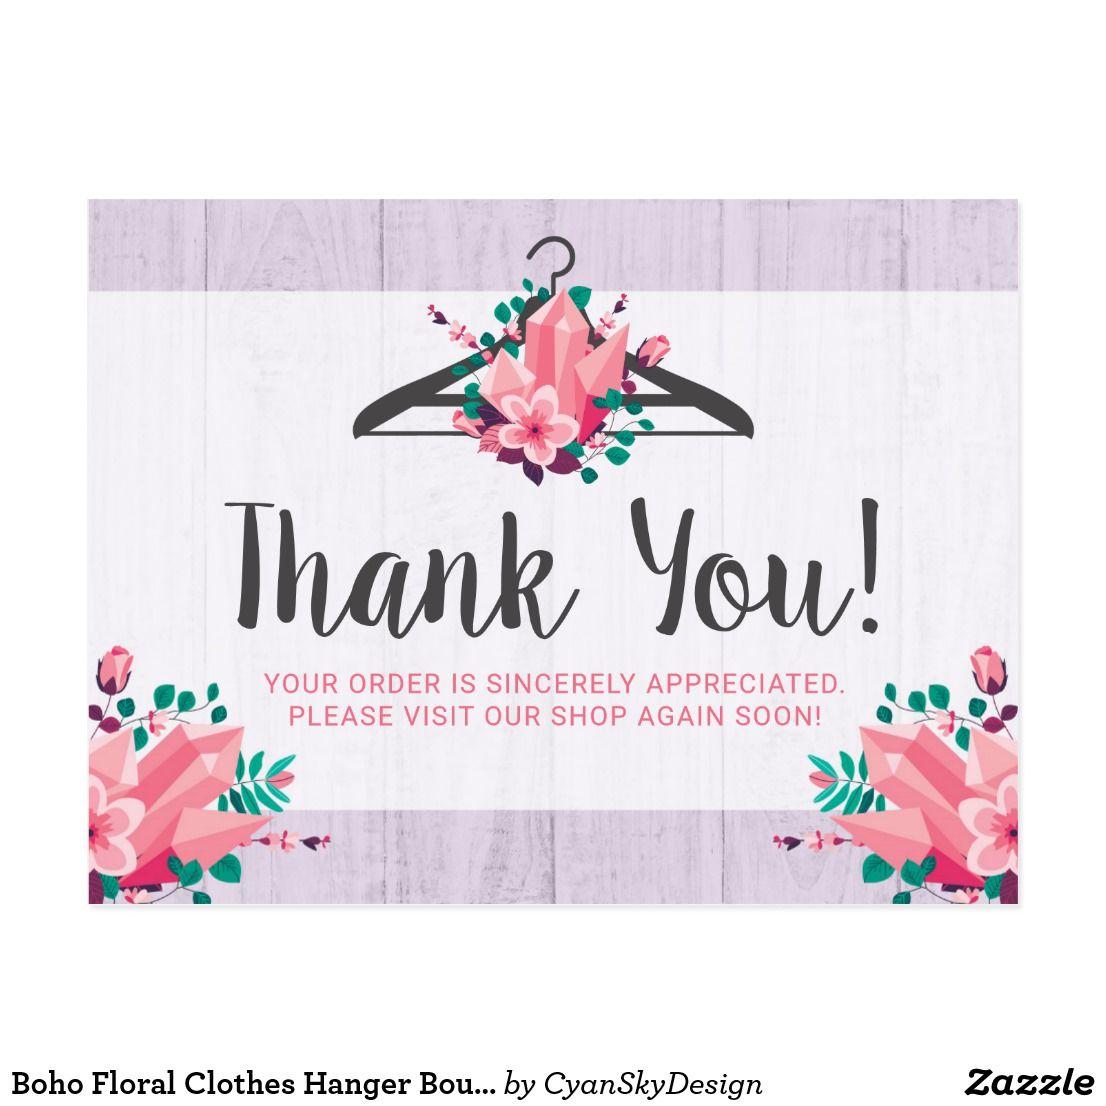 Boho Floral Clothes Hanger Boutique Thank You Postcard Zazzle